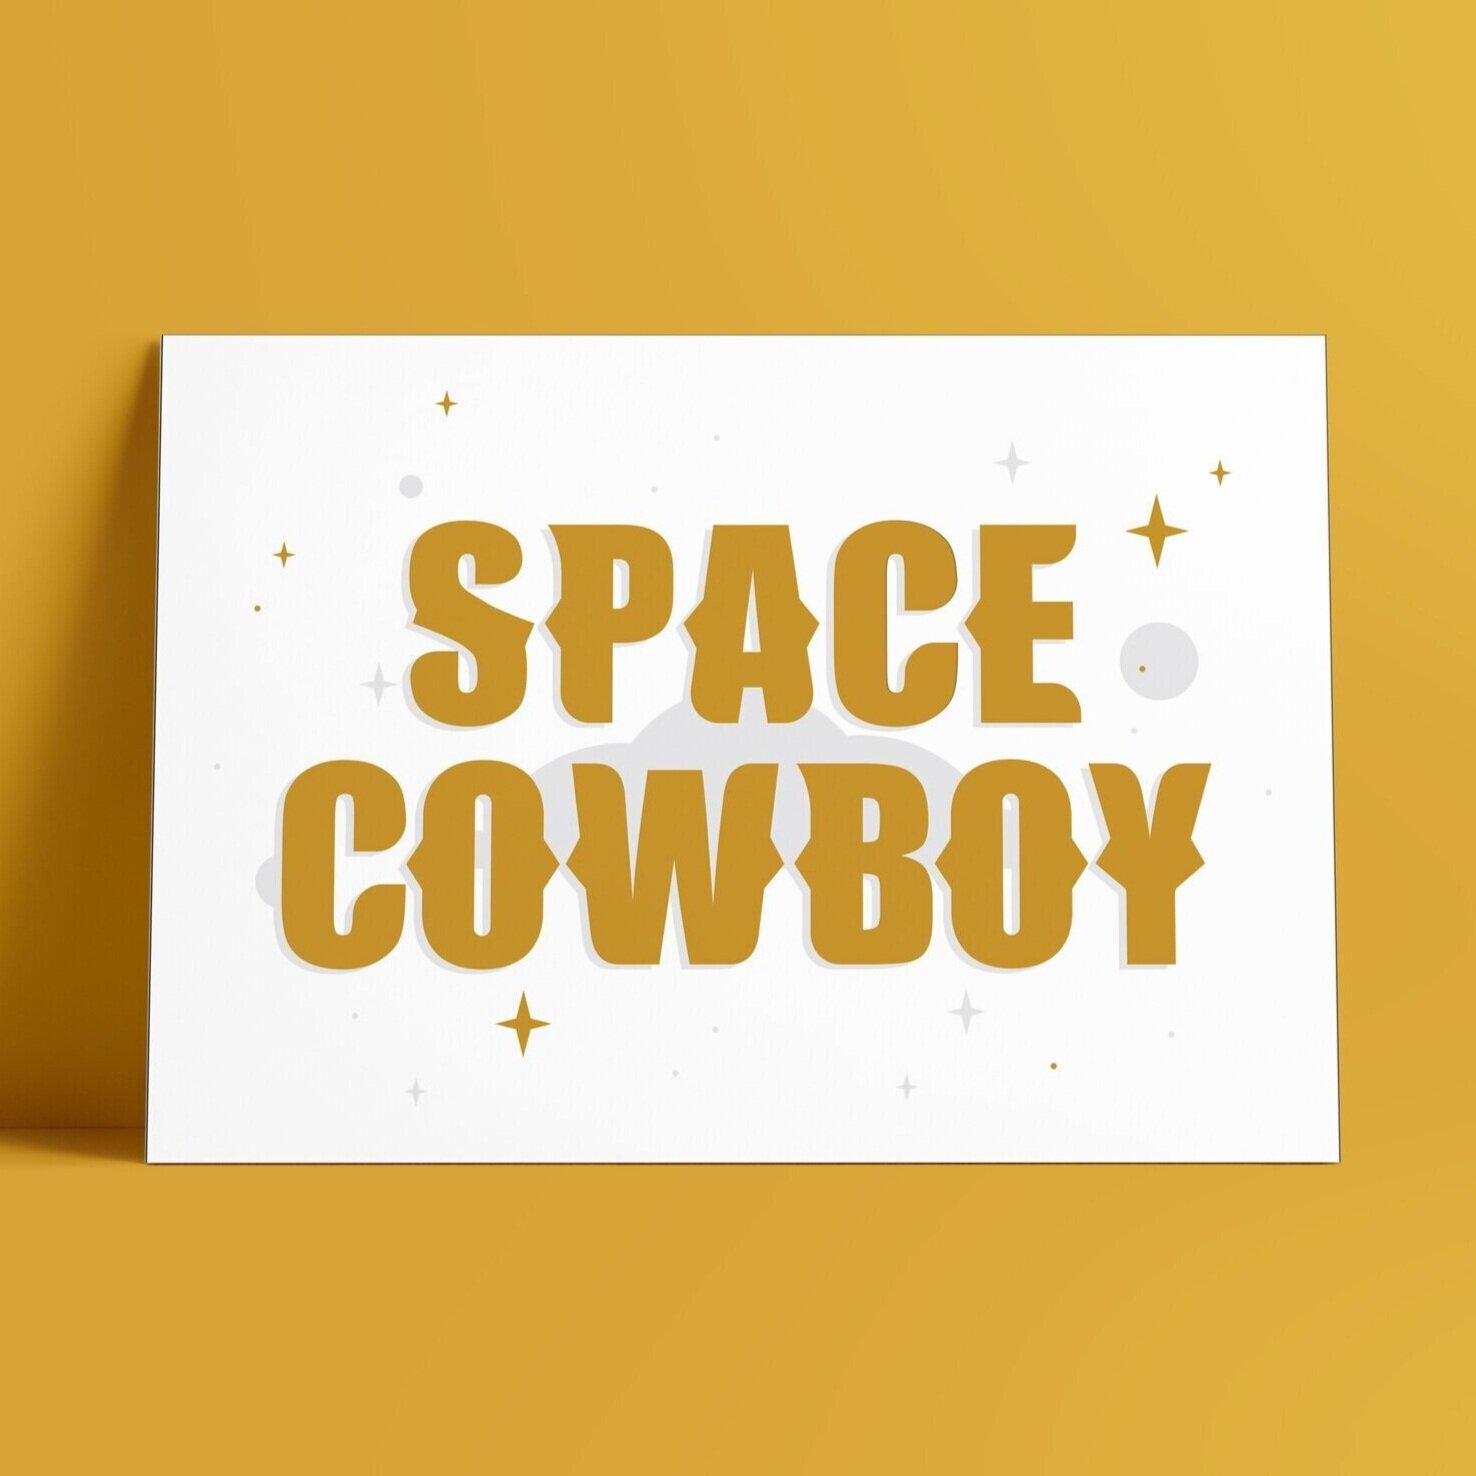 Space Cowboy - Gold